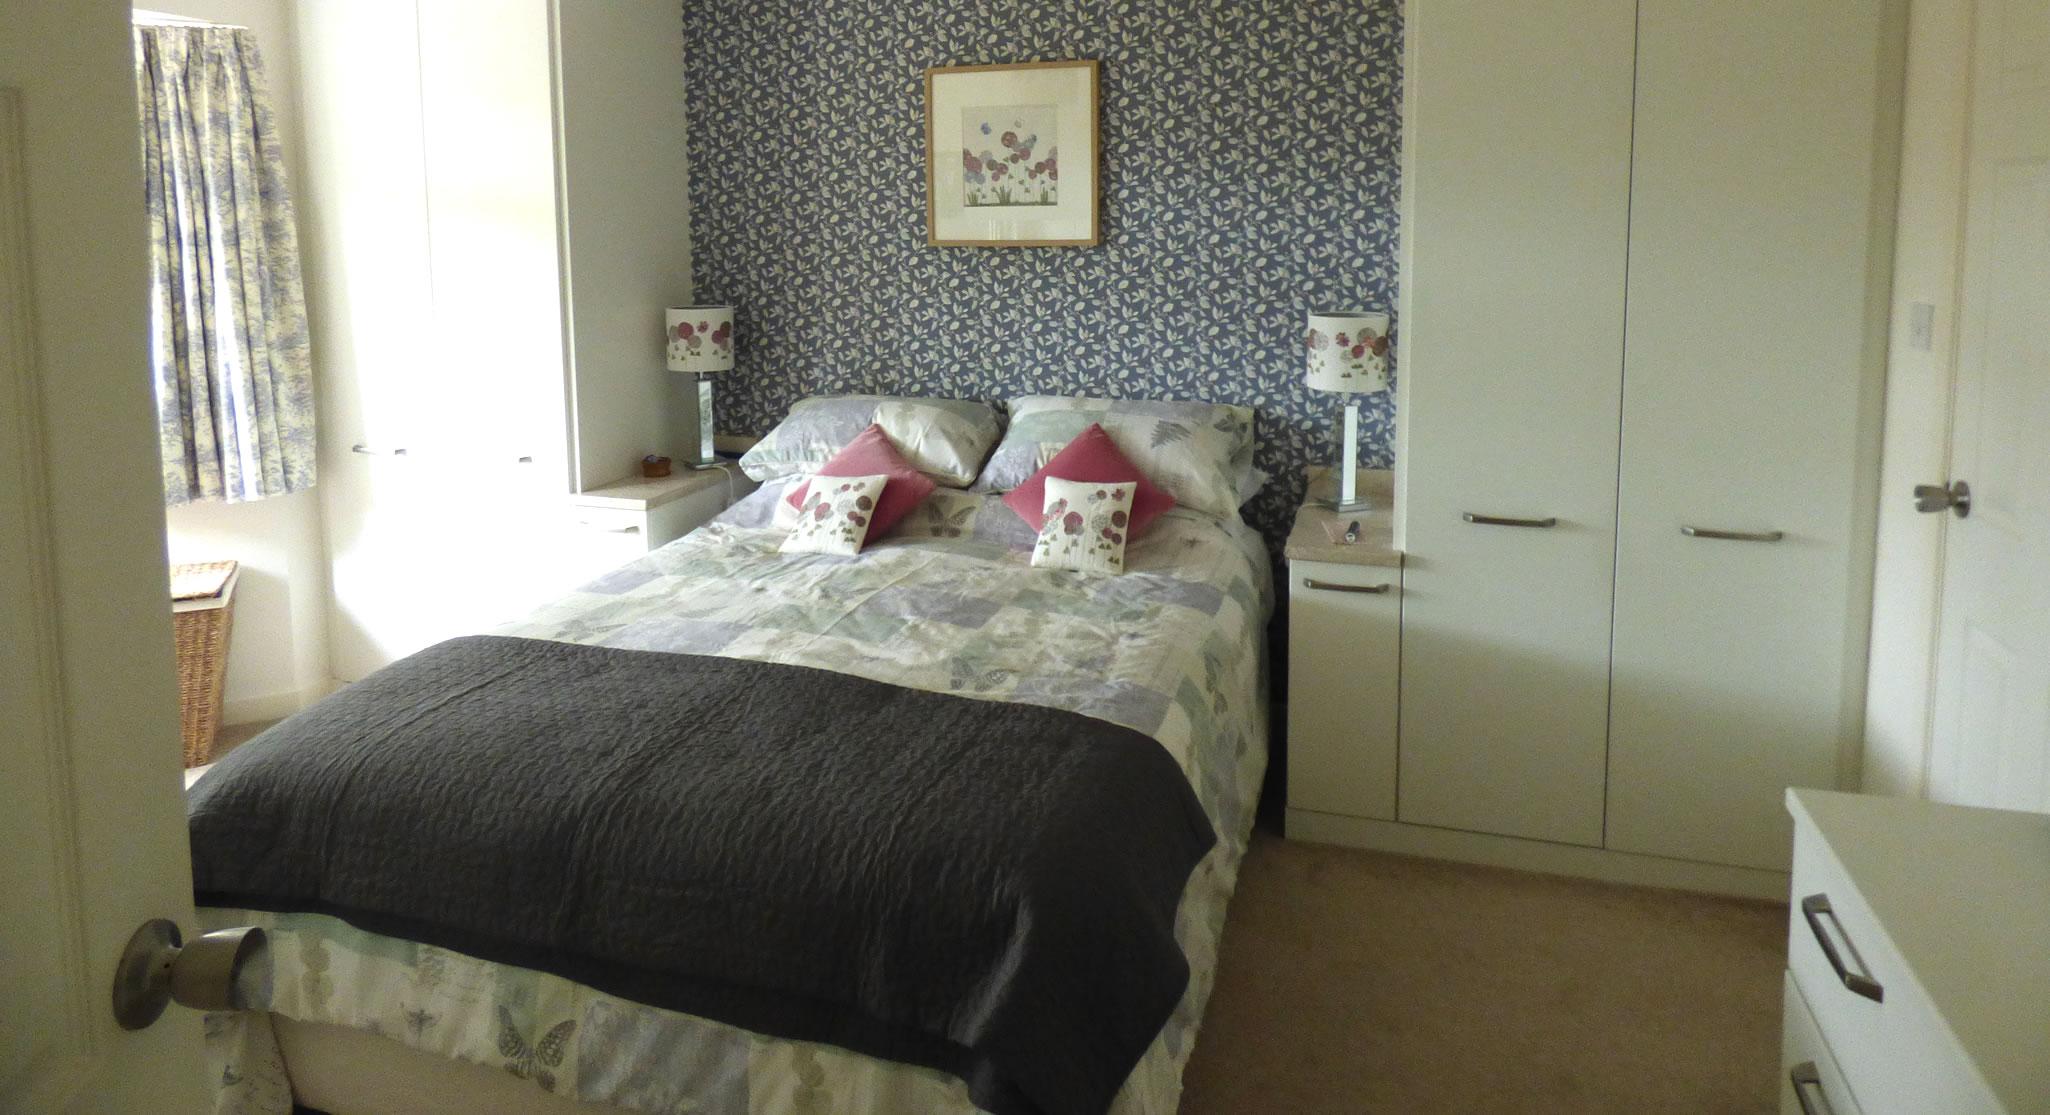 Verwood Kitchens and Bathrooms - Bedroom furniture